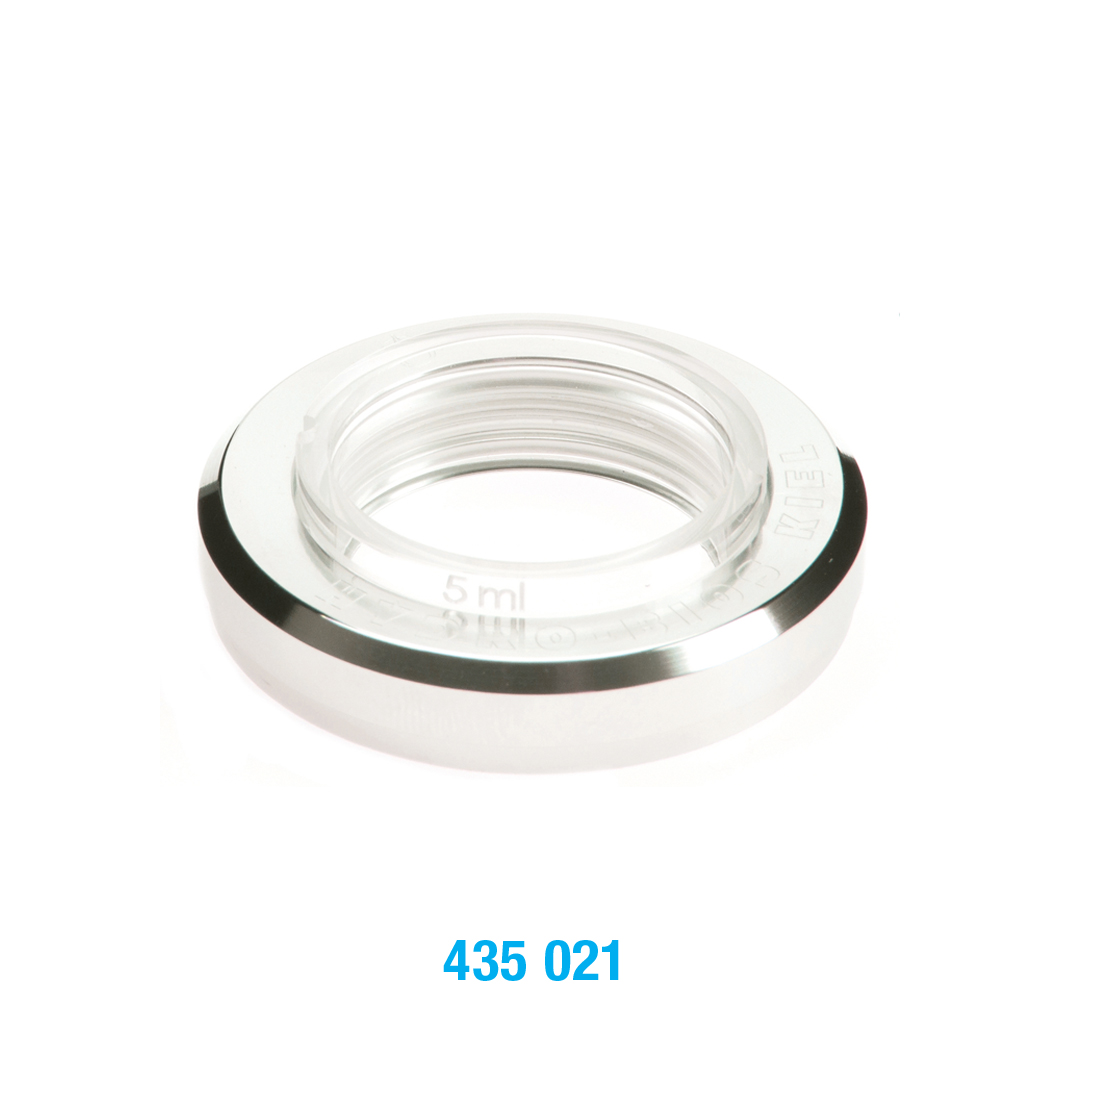 435021-tubular-plankton-chamber-hydrobios